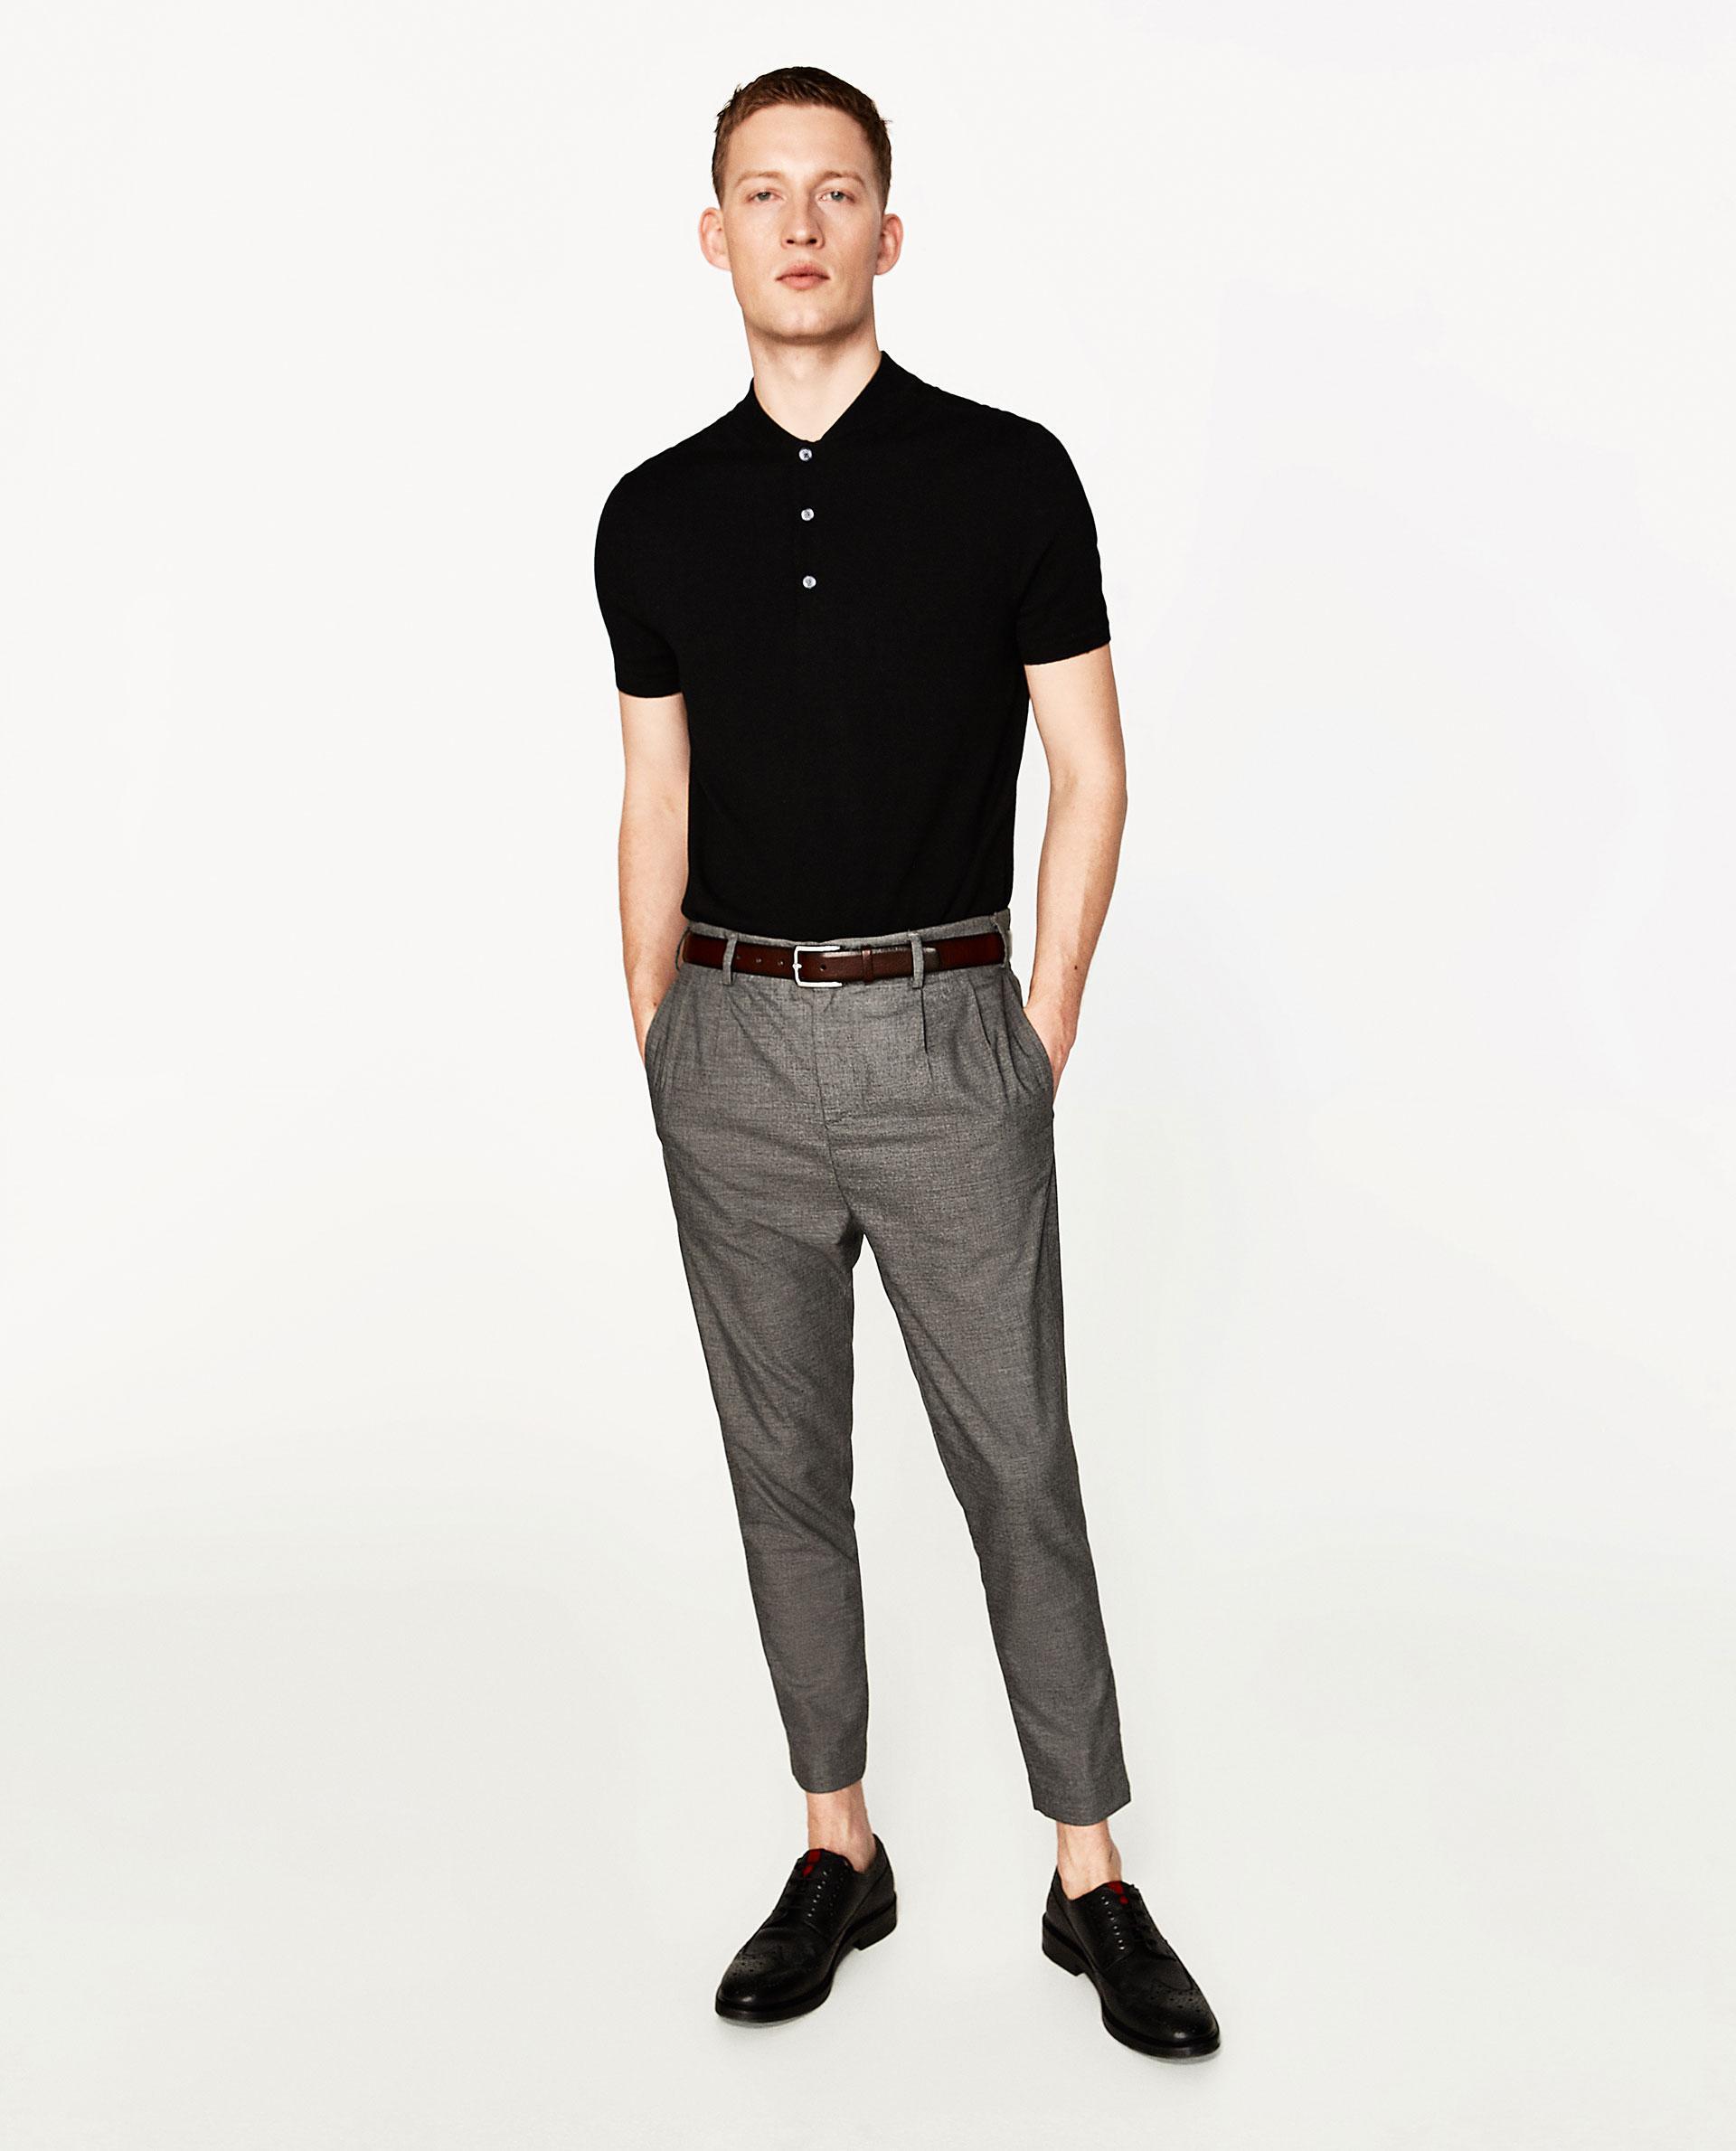 Zara viscose polo shirt in black for men lyst for Zara mens shirts sale